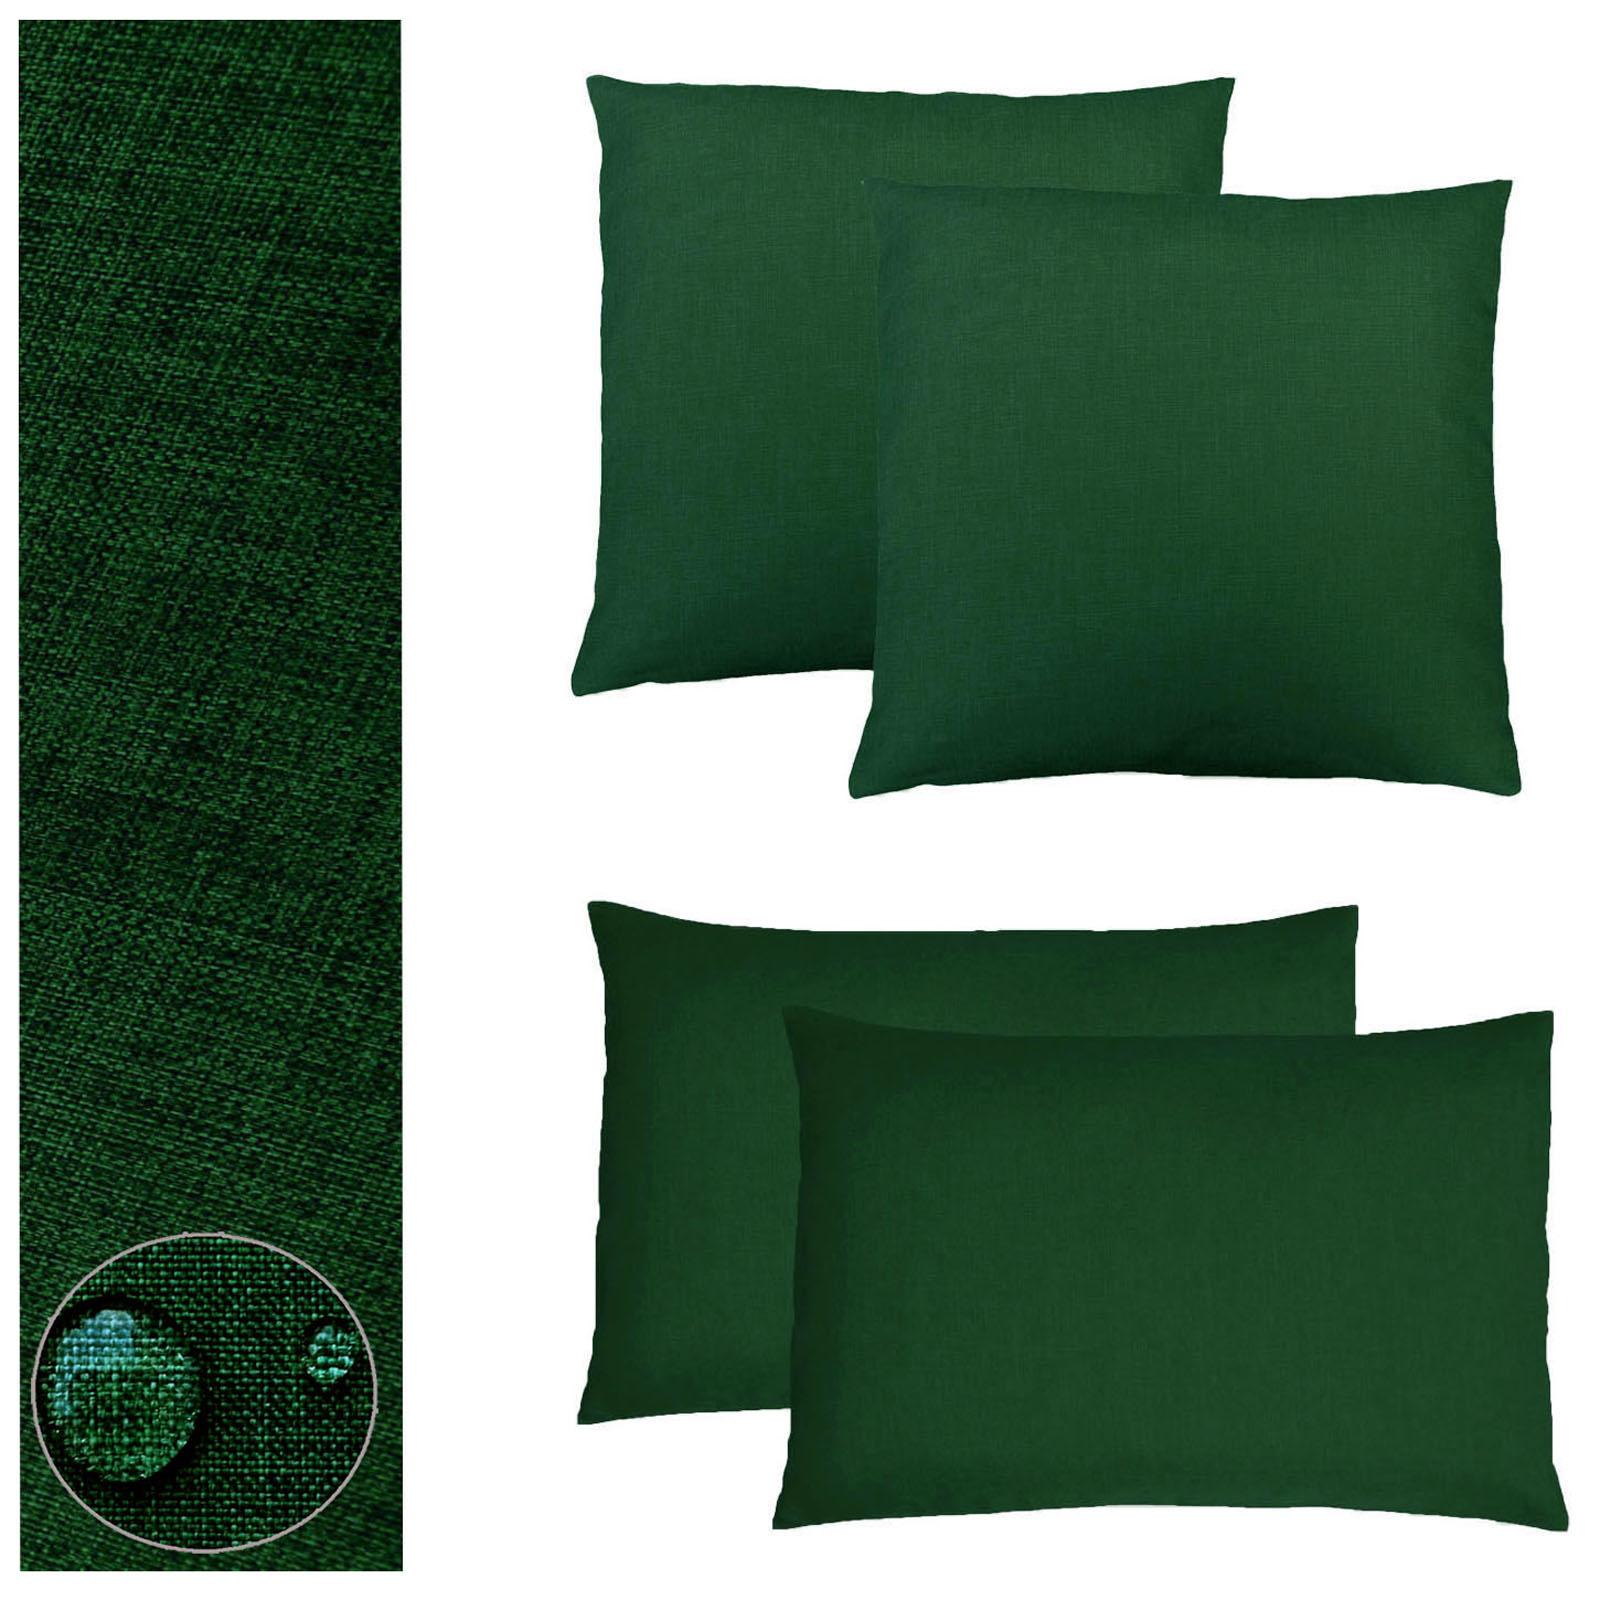 kissenh lle 2 st ck leinen optik 40x40 50x50 40x60 kissenbezug einfarbig lounge ebay. Black Bedroom Furniture Sets. Home Design Ideas